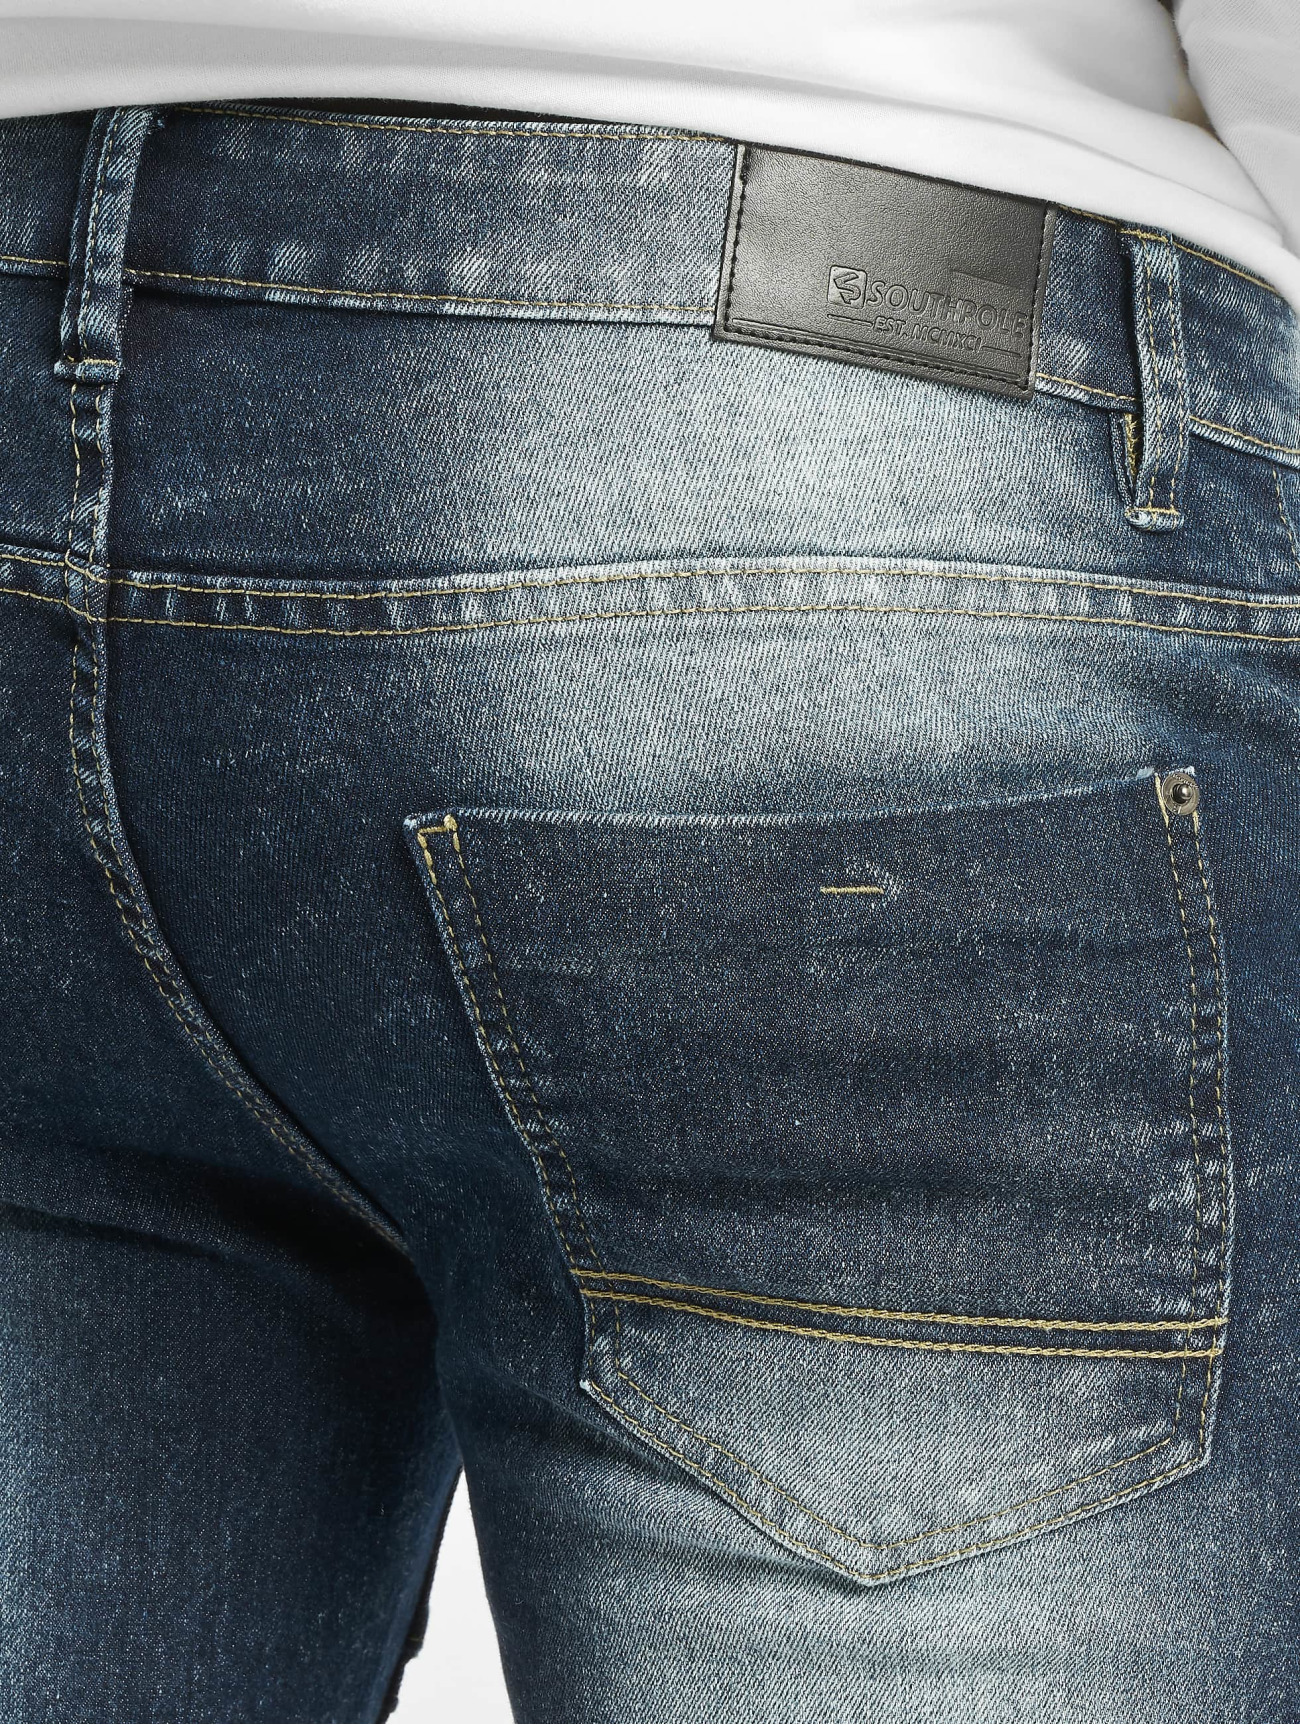 Southpole  Biker  bleu Homme Short  675523 Homme Pantalons & Shorts